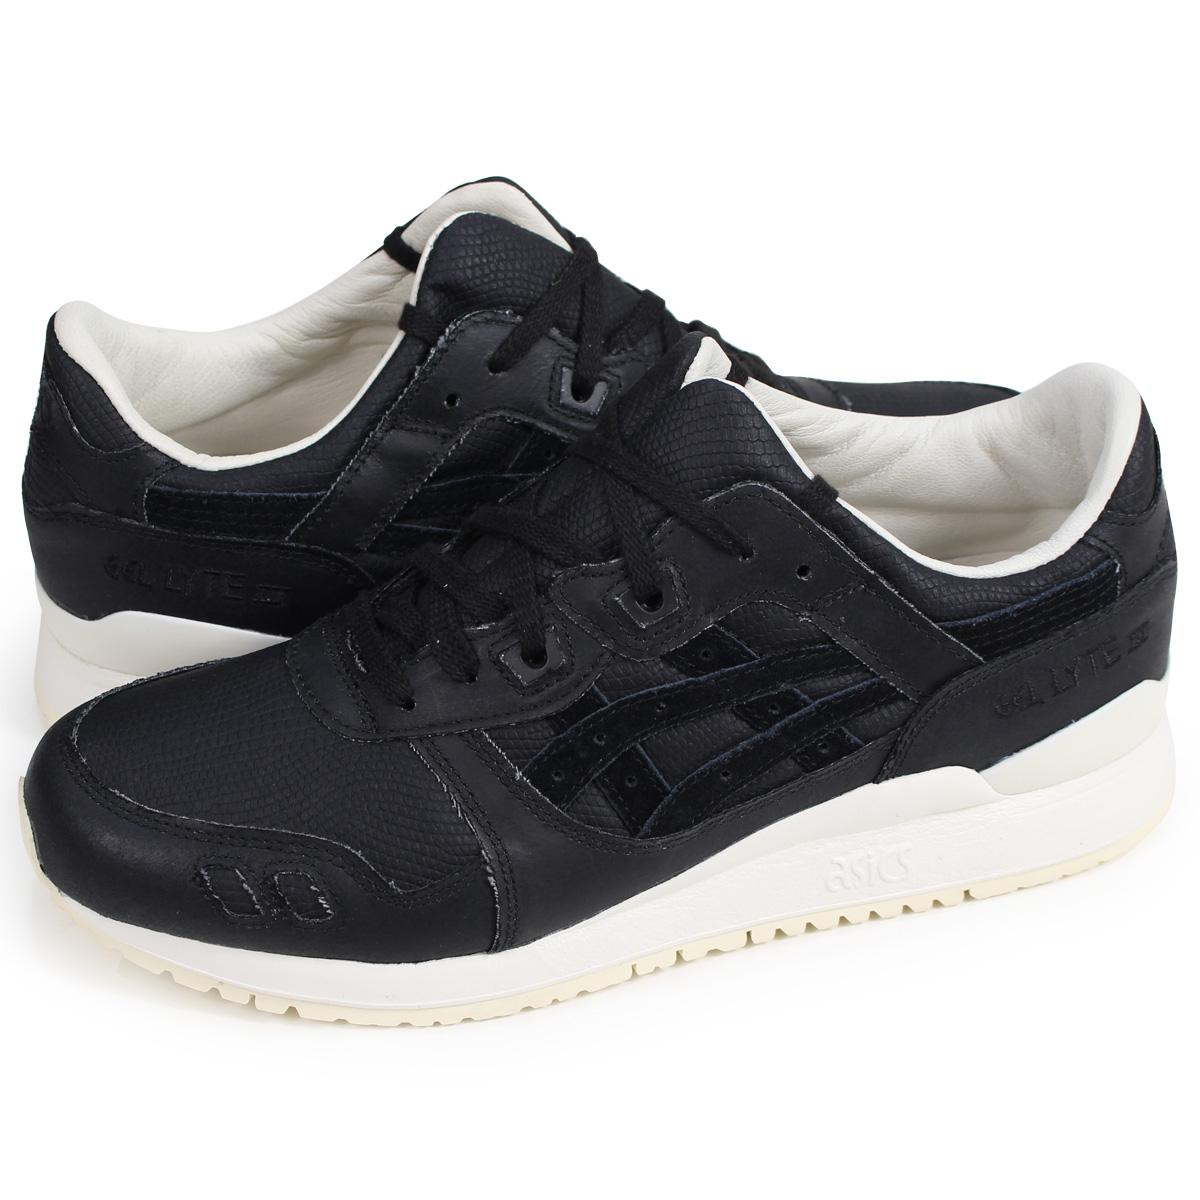 huge discount 9ac6c 8f264 asics Tiger GEL-LYTE III ASICS tiger gel light 3 sneakers H842N-9090 men  black